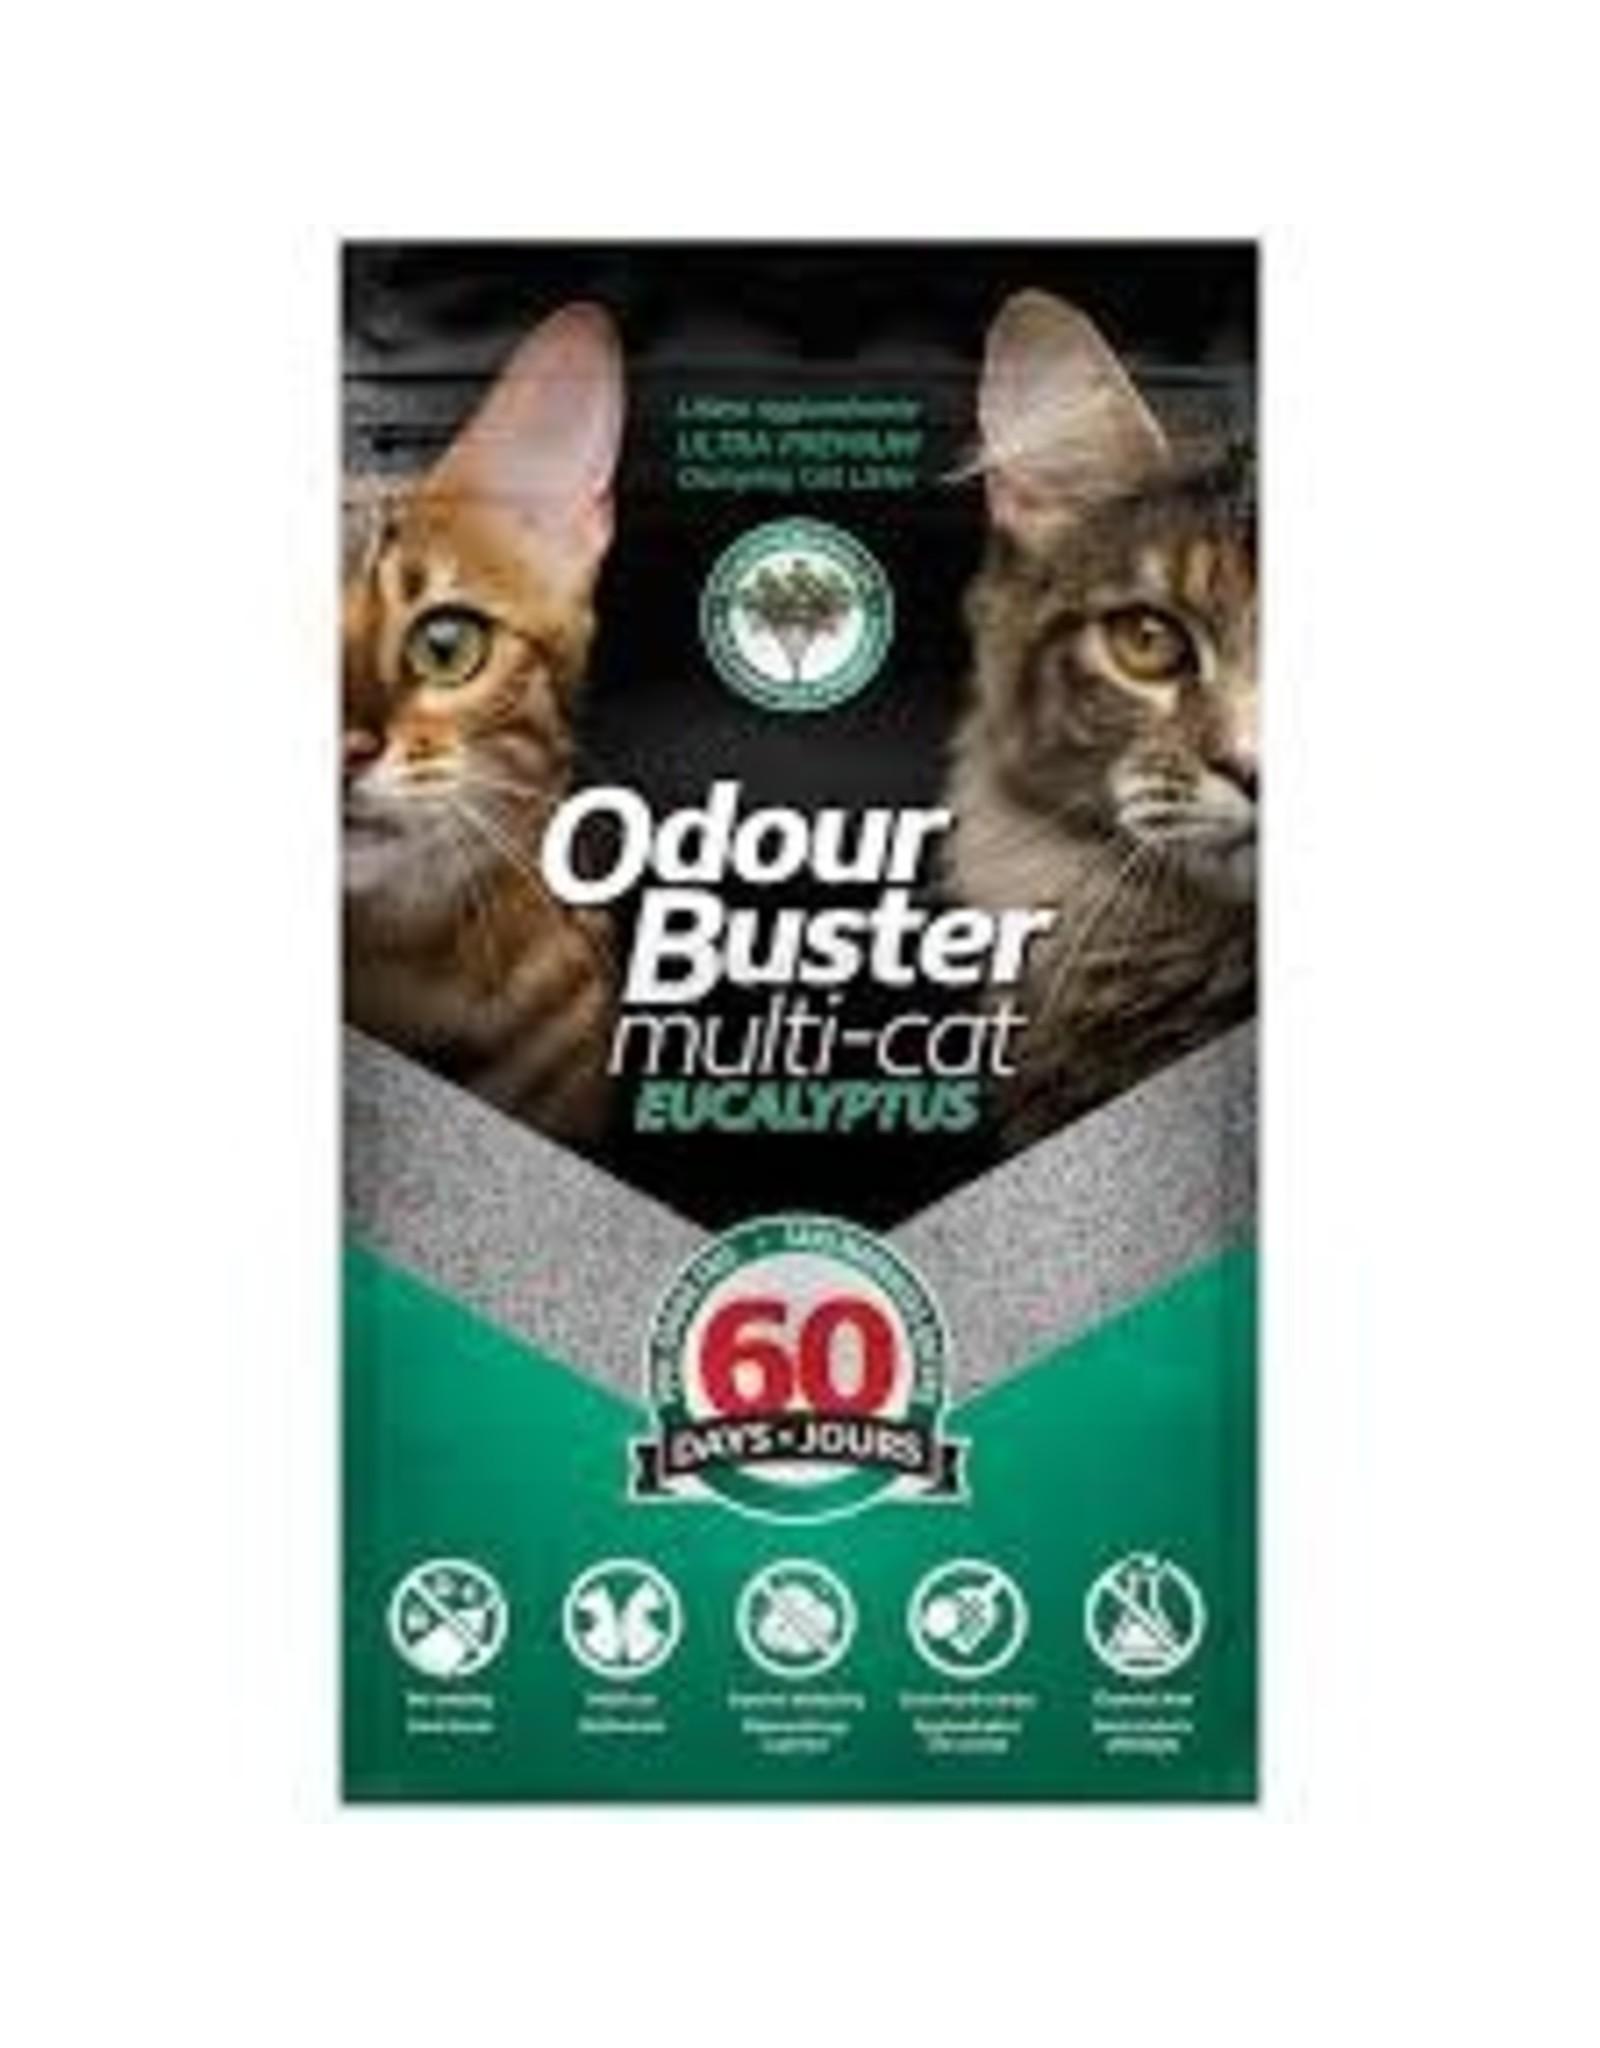 Odour Buster Odour Buster Multi-Cat Eucalyptus Clumping Litter 12KG